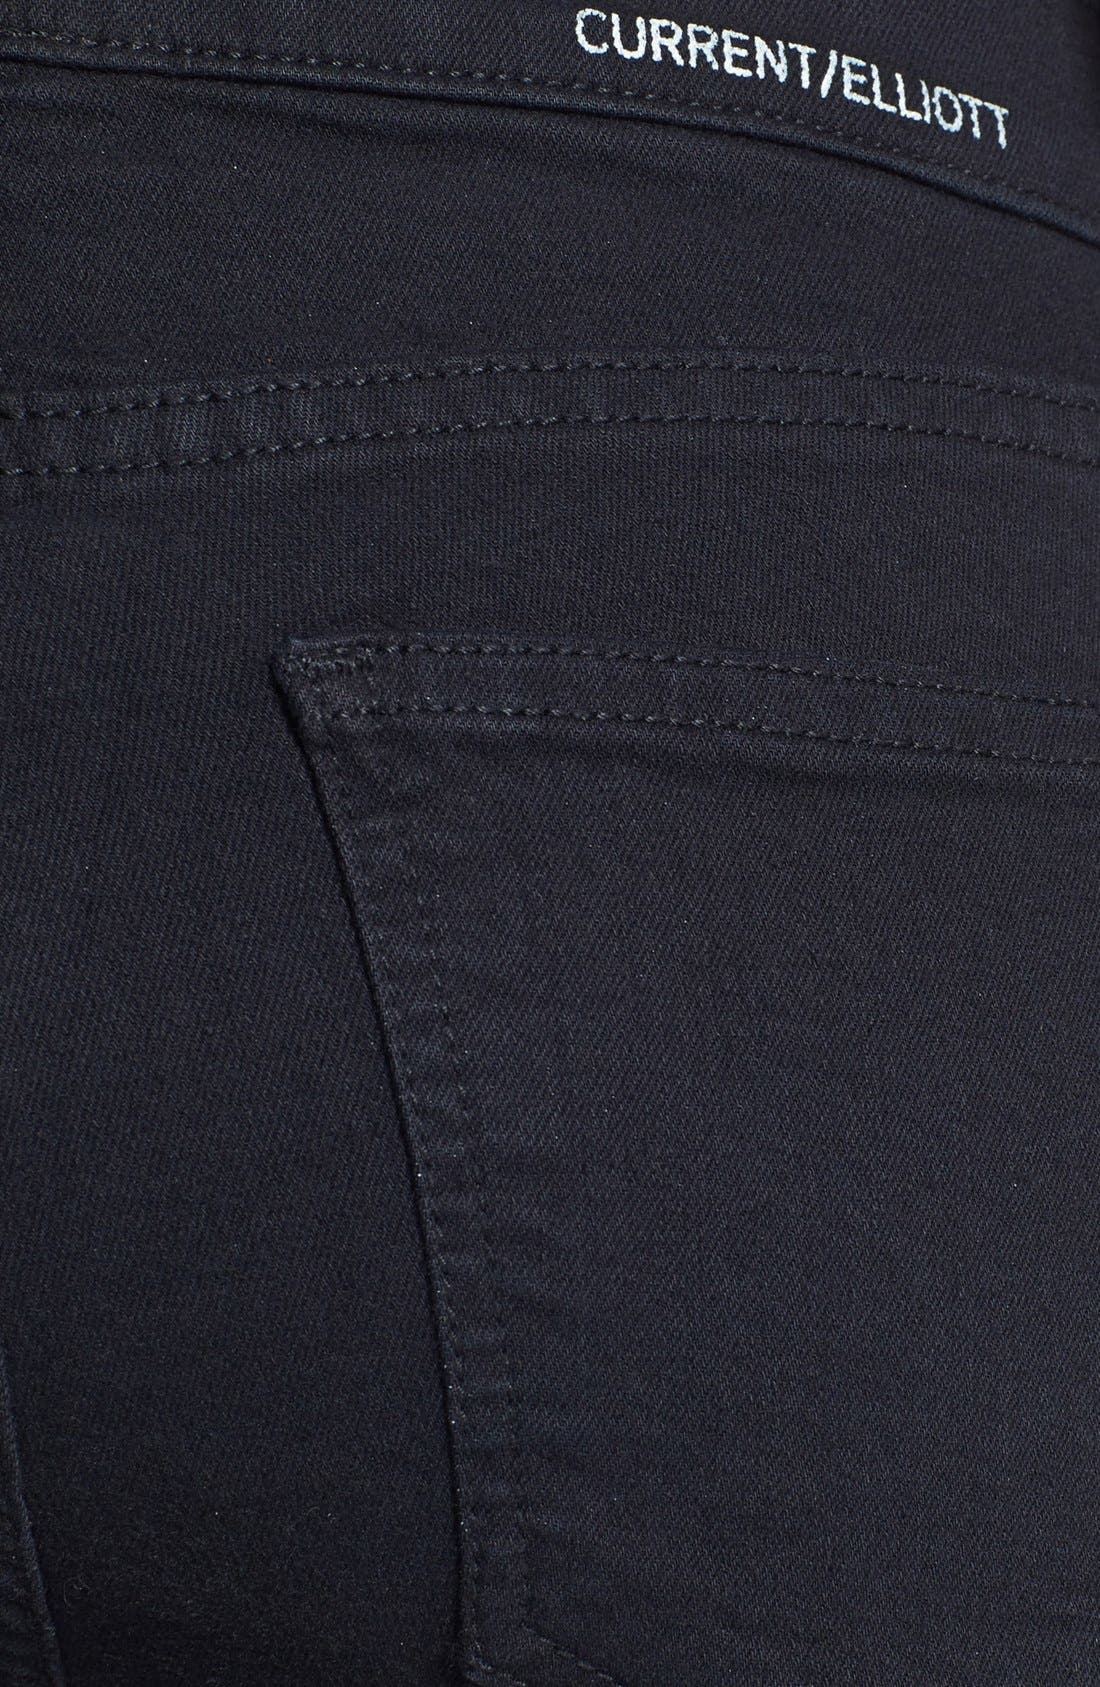 Alternate Image 3  - Current/Elliott Skinny Ankle Jeans